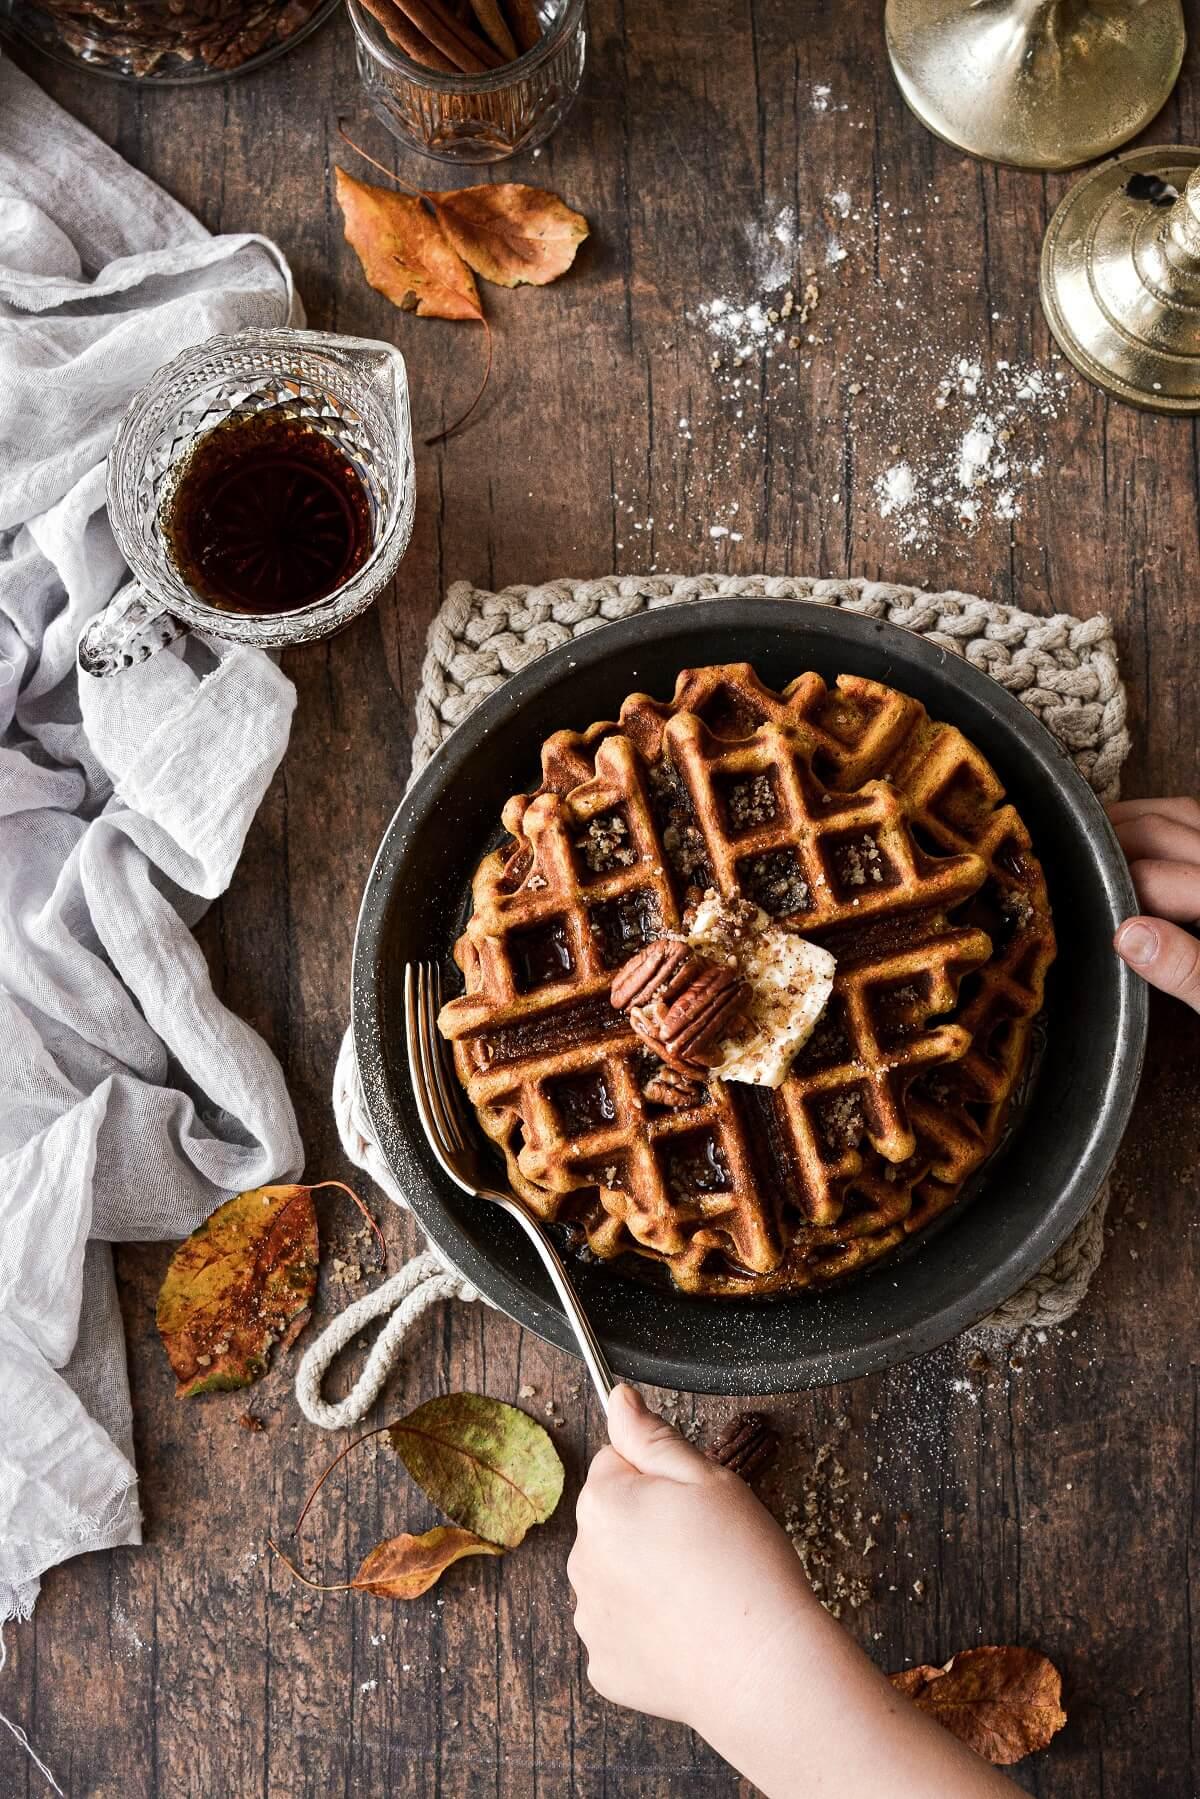 Hands reaching to cut into a plate of pumpkin pecan waffles.